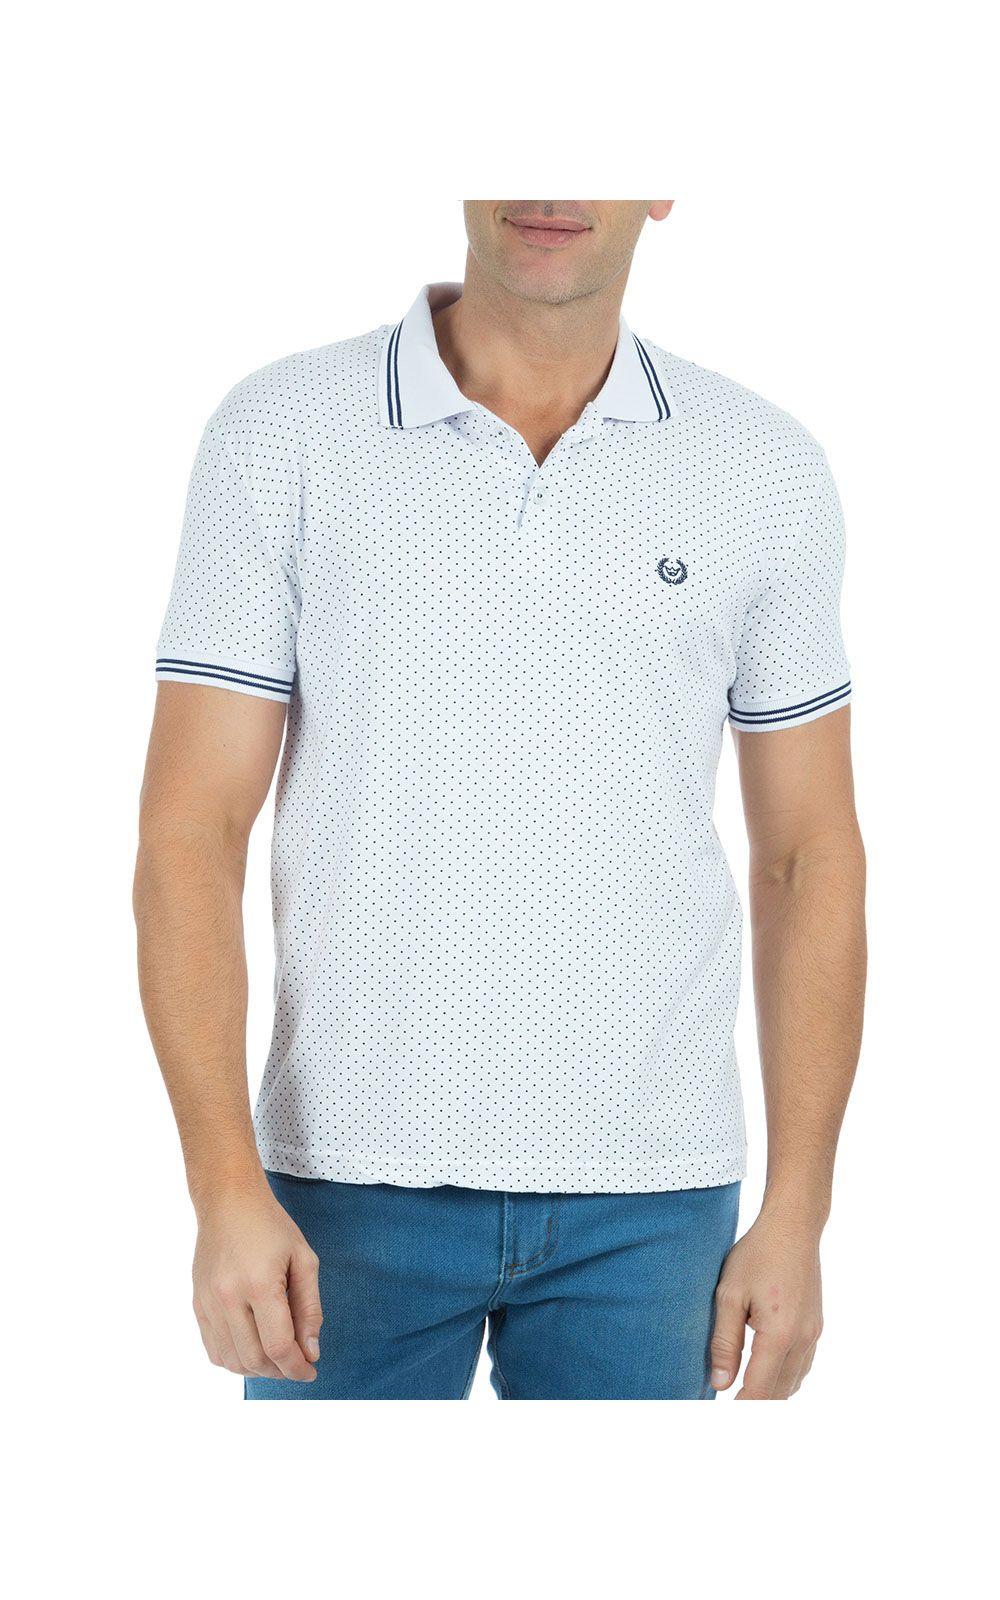 Camisa Polo Masculina Estampada Branca. undefined 4fbec466dcae2